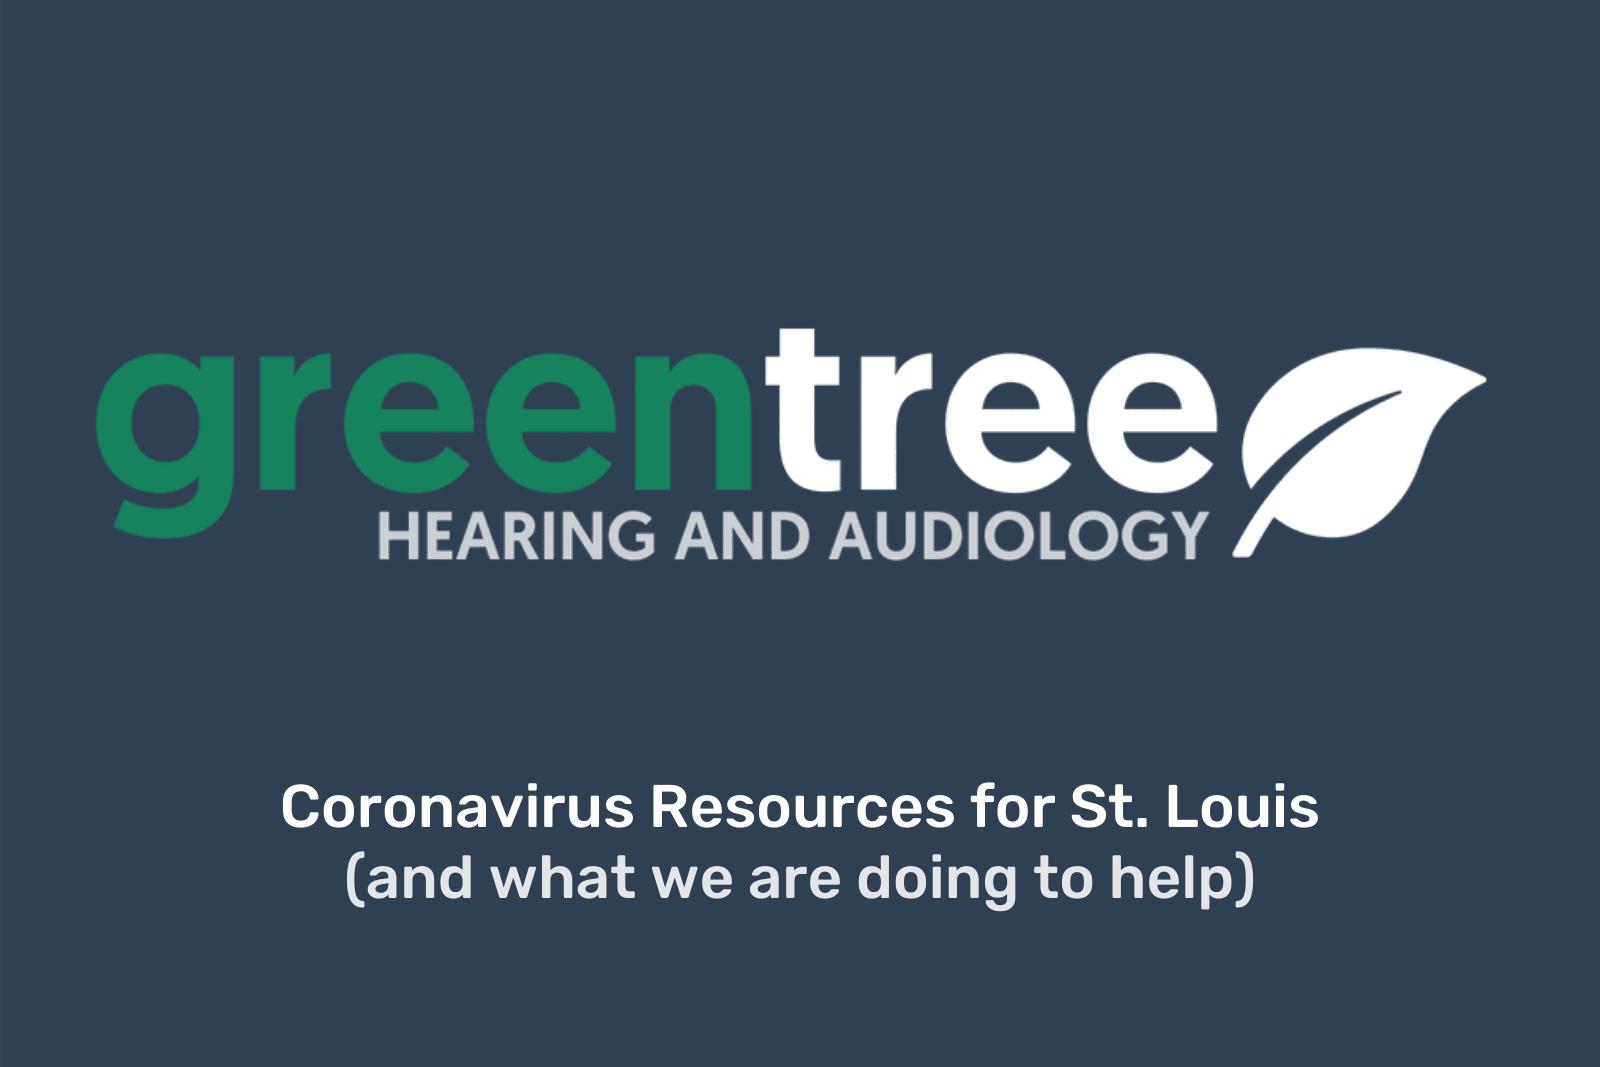 Coronavirus Resources for St. Louis